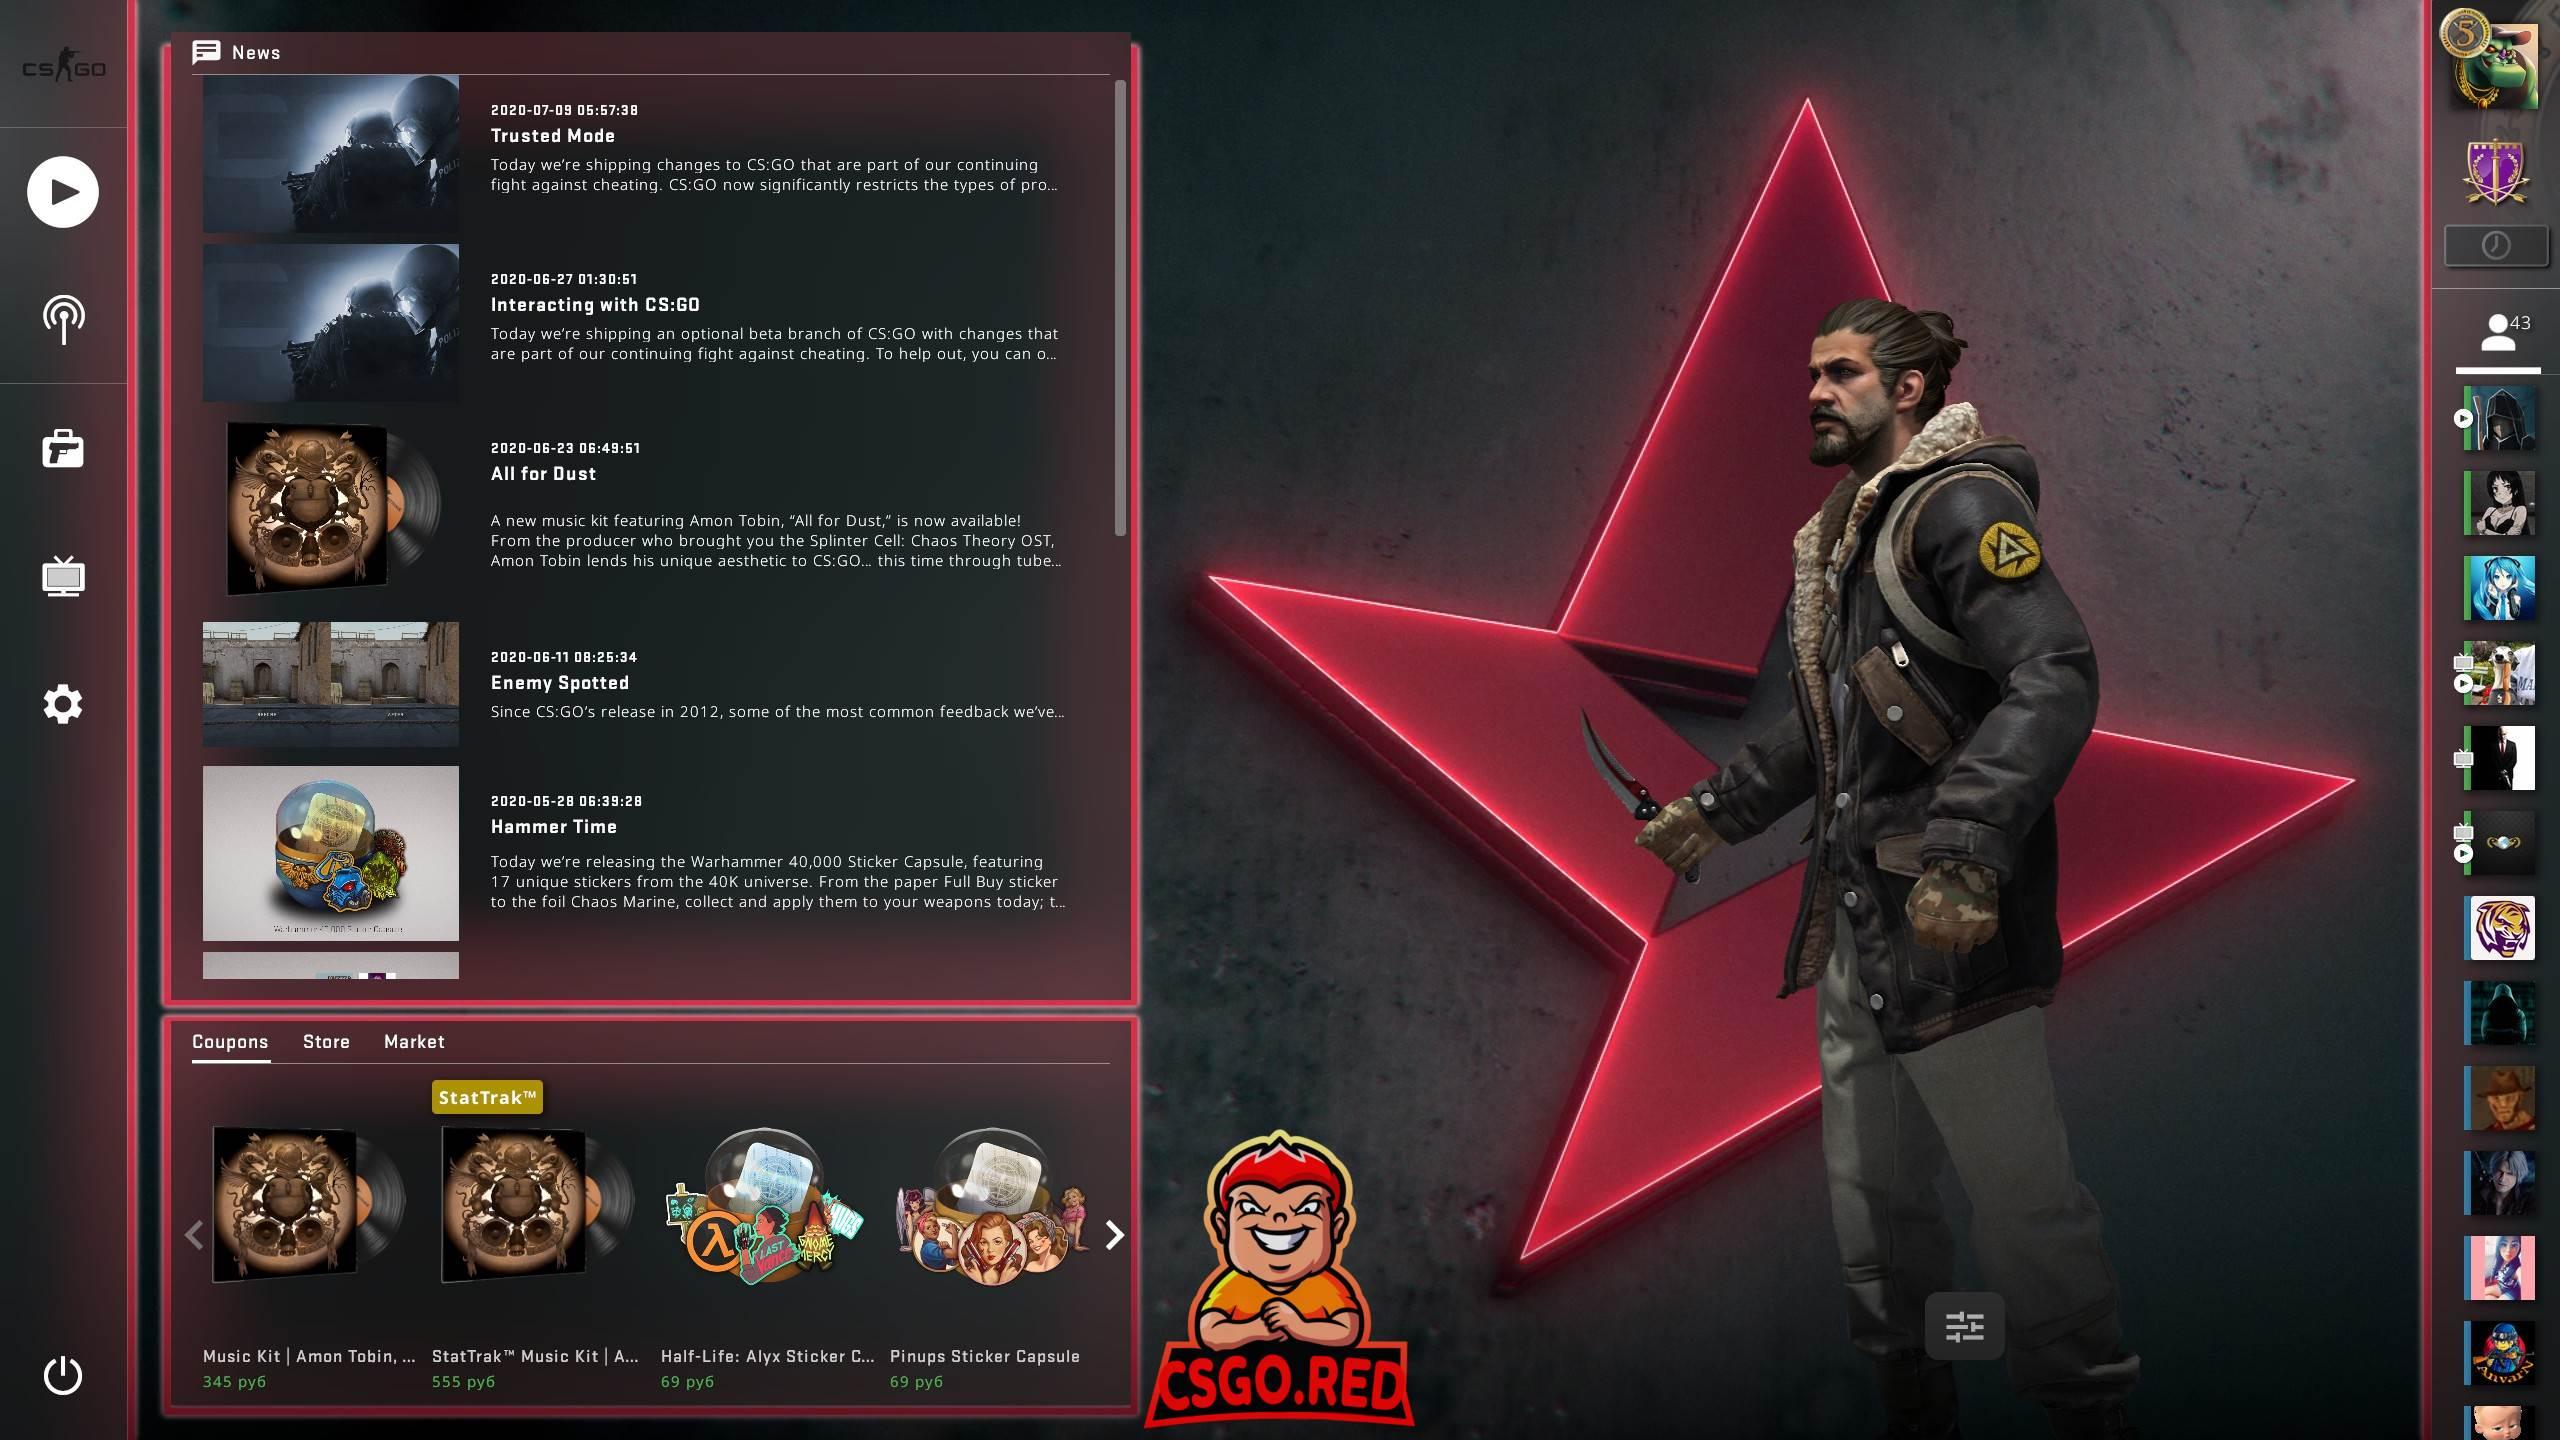 Astralis Panorama UI Background